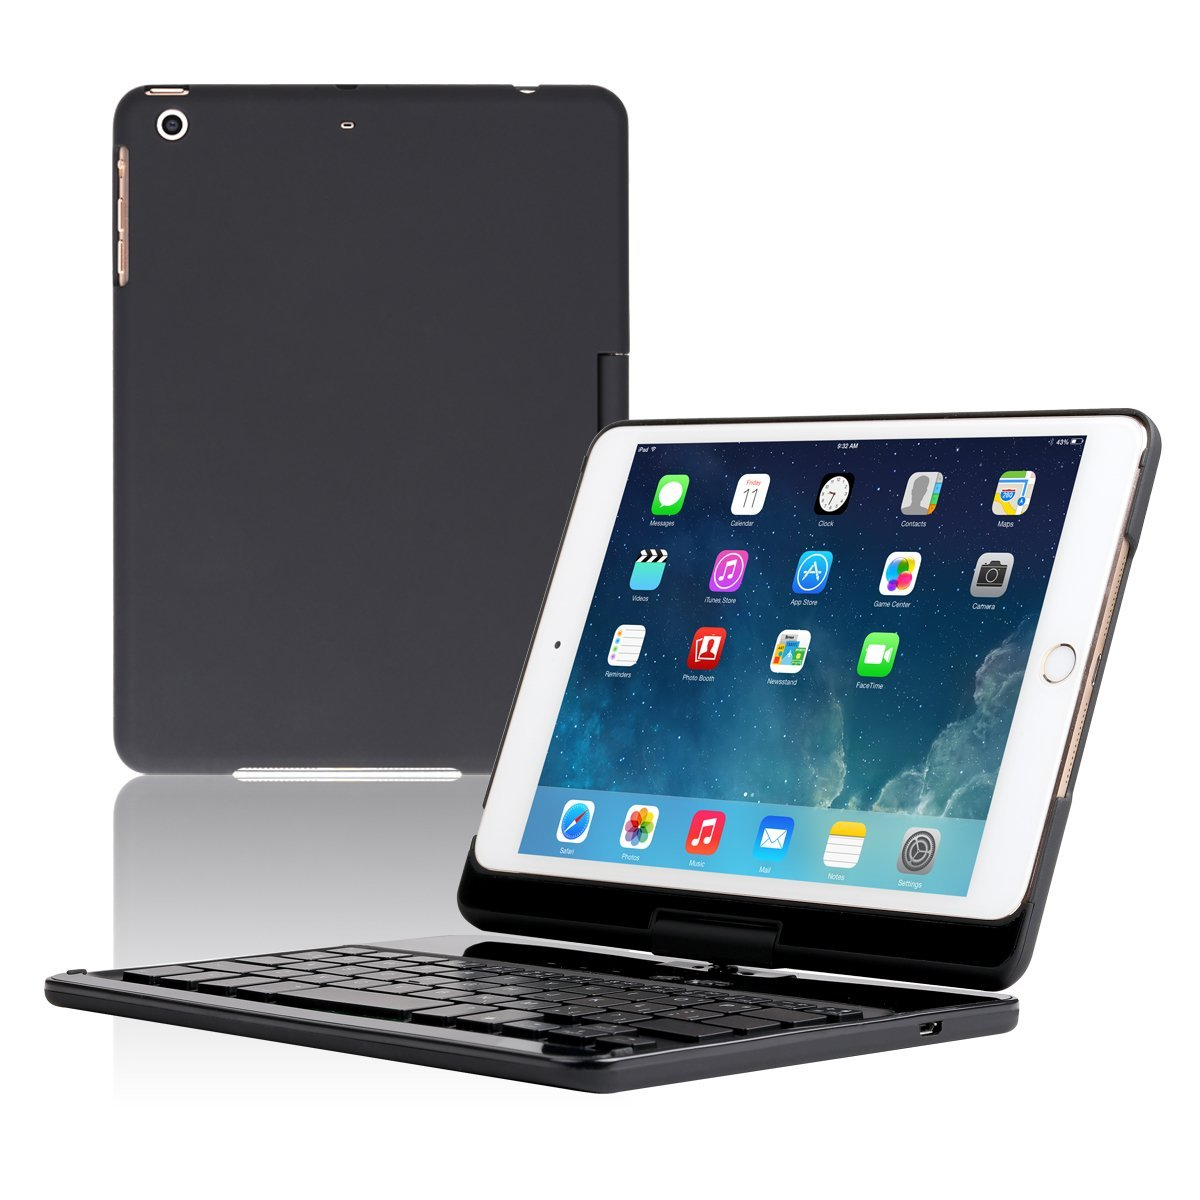 Koch Creative Backlit Wireless Keyboard 360 Rotation Auto Sleep/Wake up for iPad Mini 123(Black)